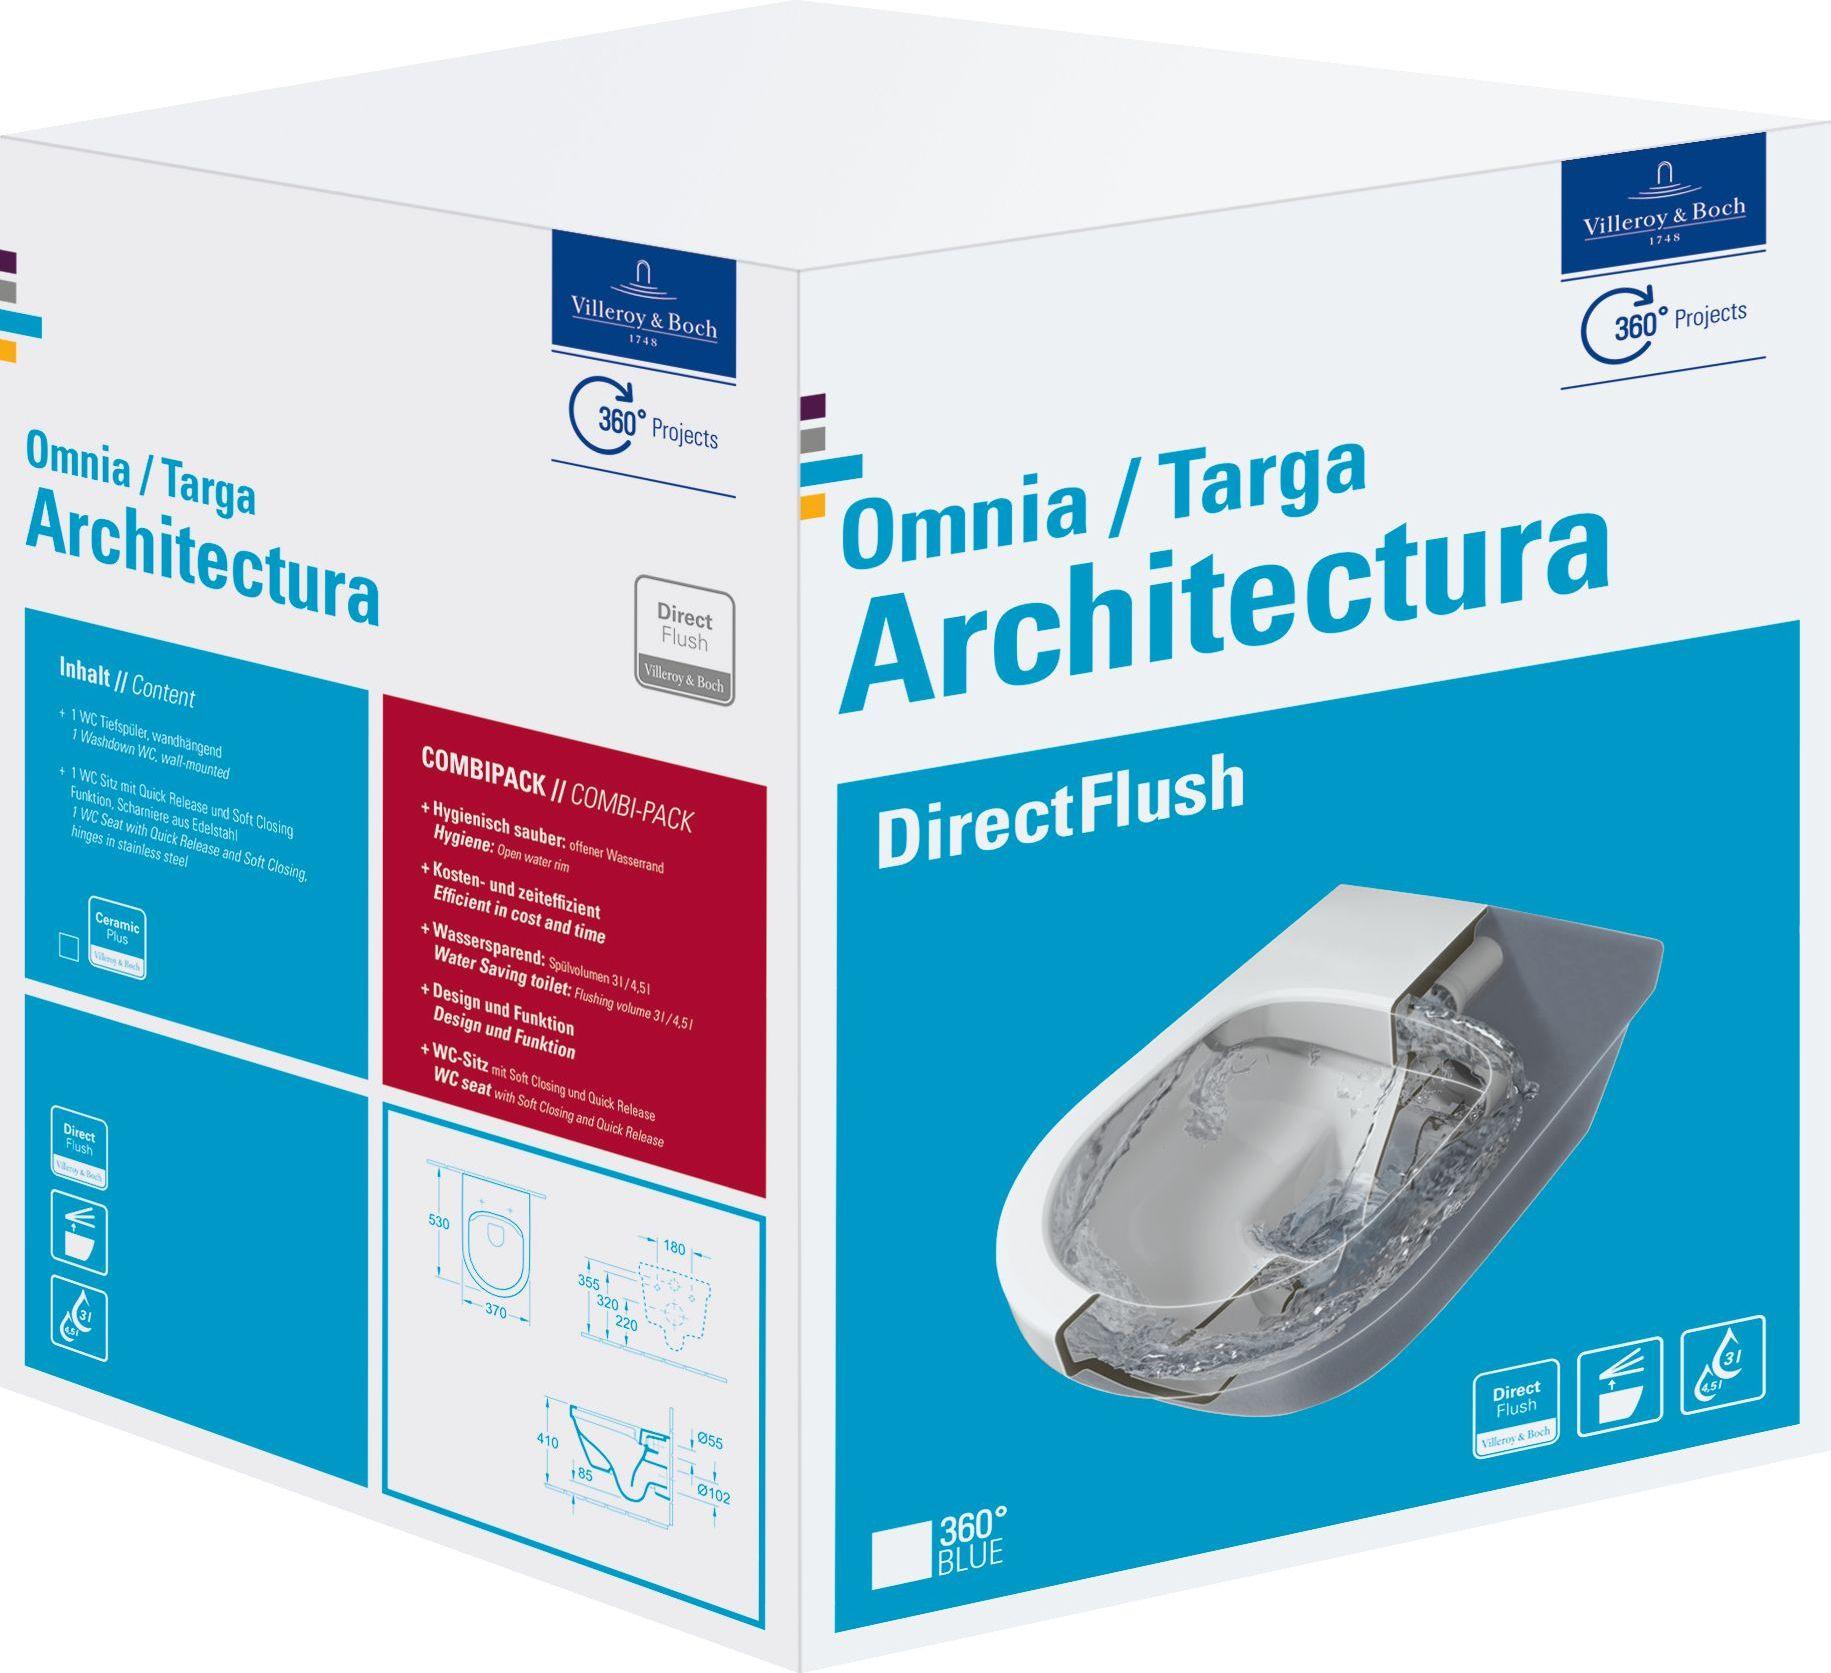 Miska WC Villeroy & Boch Architectura DirectFlush wiszaca CeramicPlus (5684HRR1) 5684HRR1